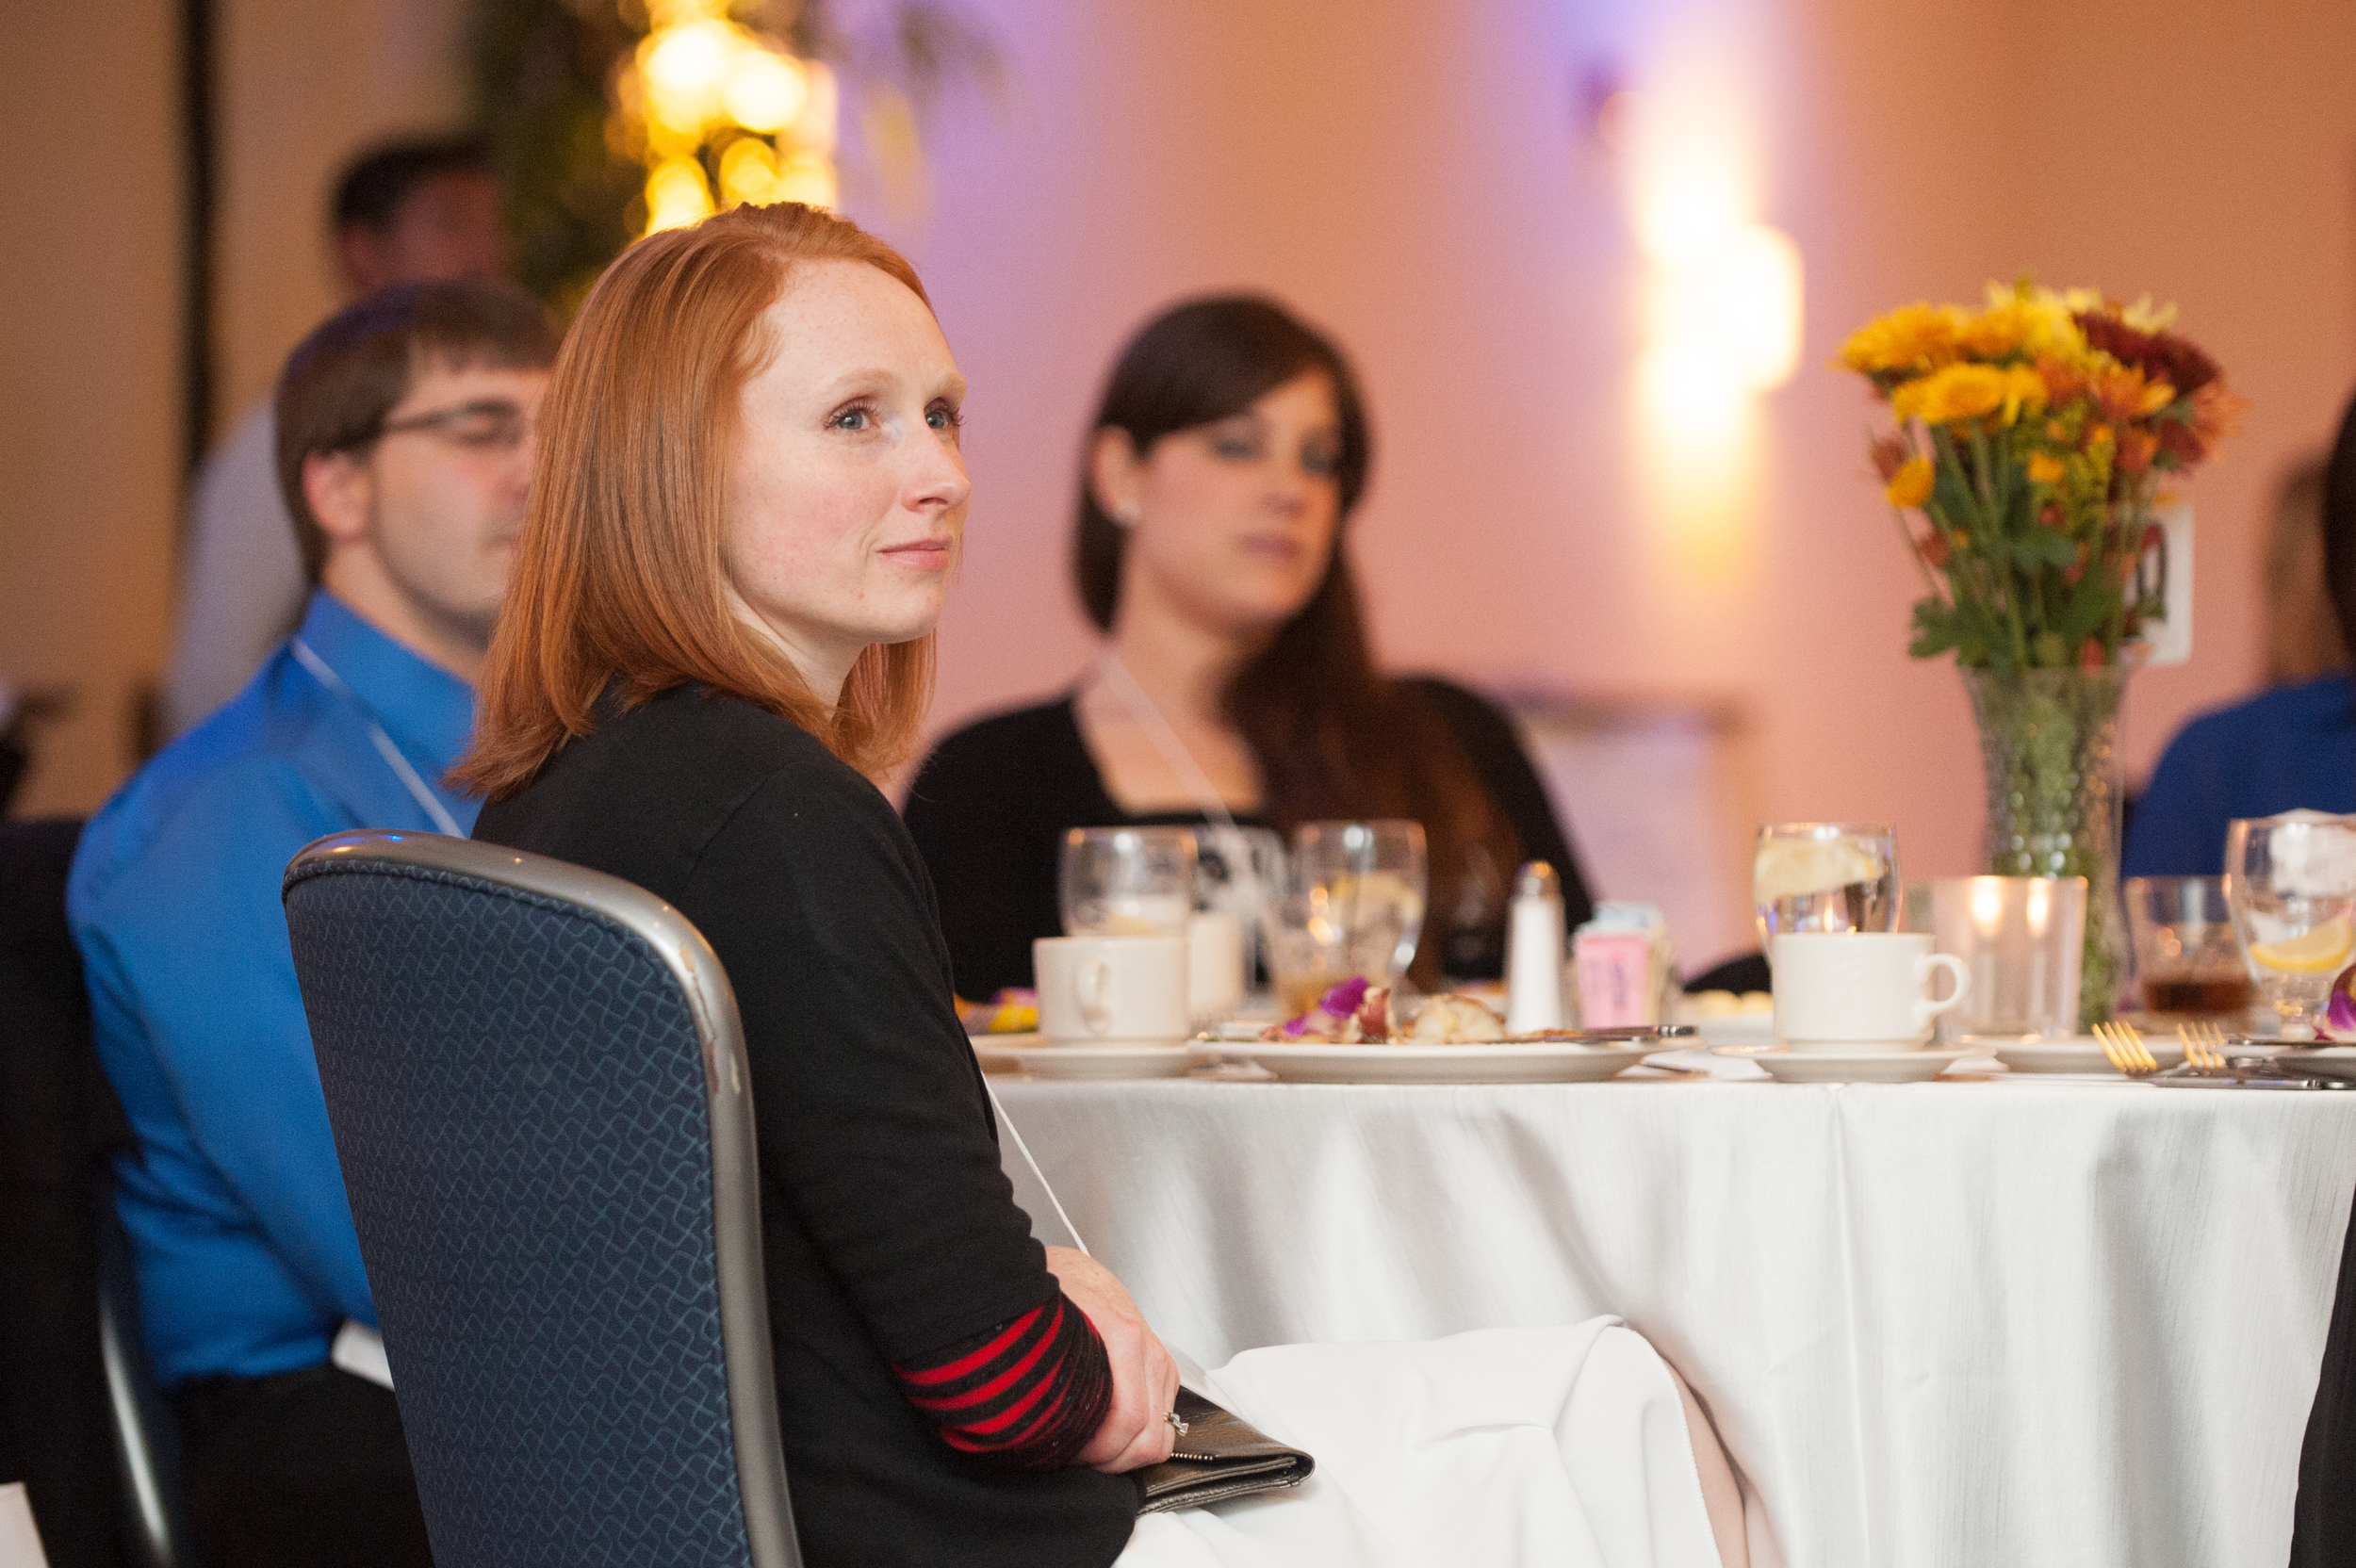 2014-11-15-ABACS Annual Dinner-64.jpg